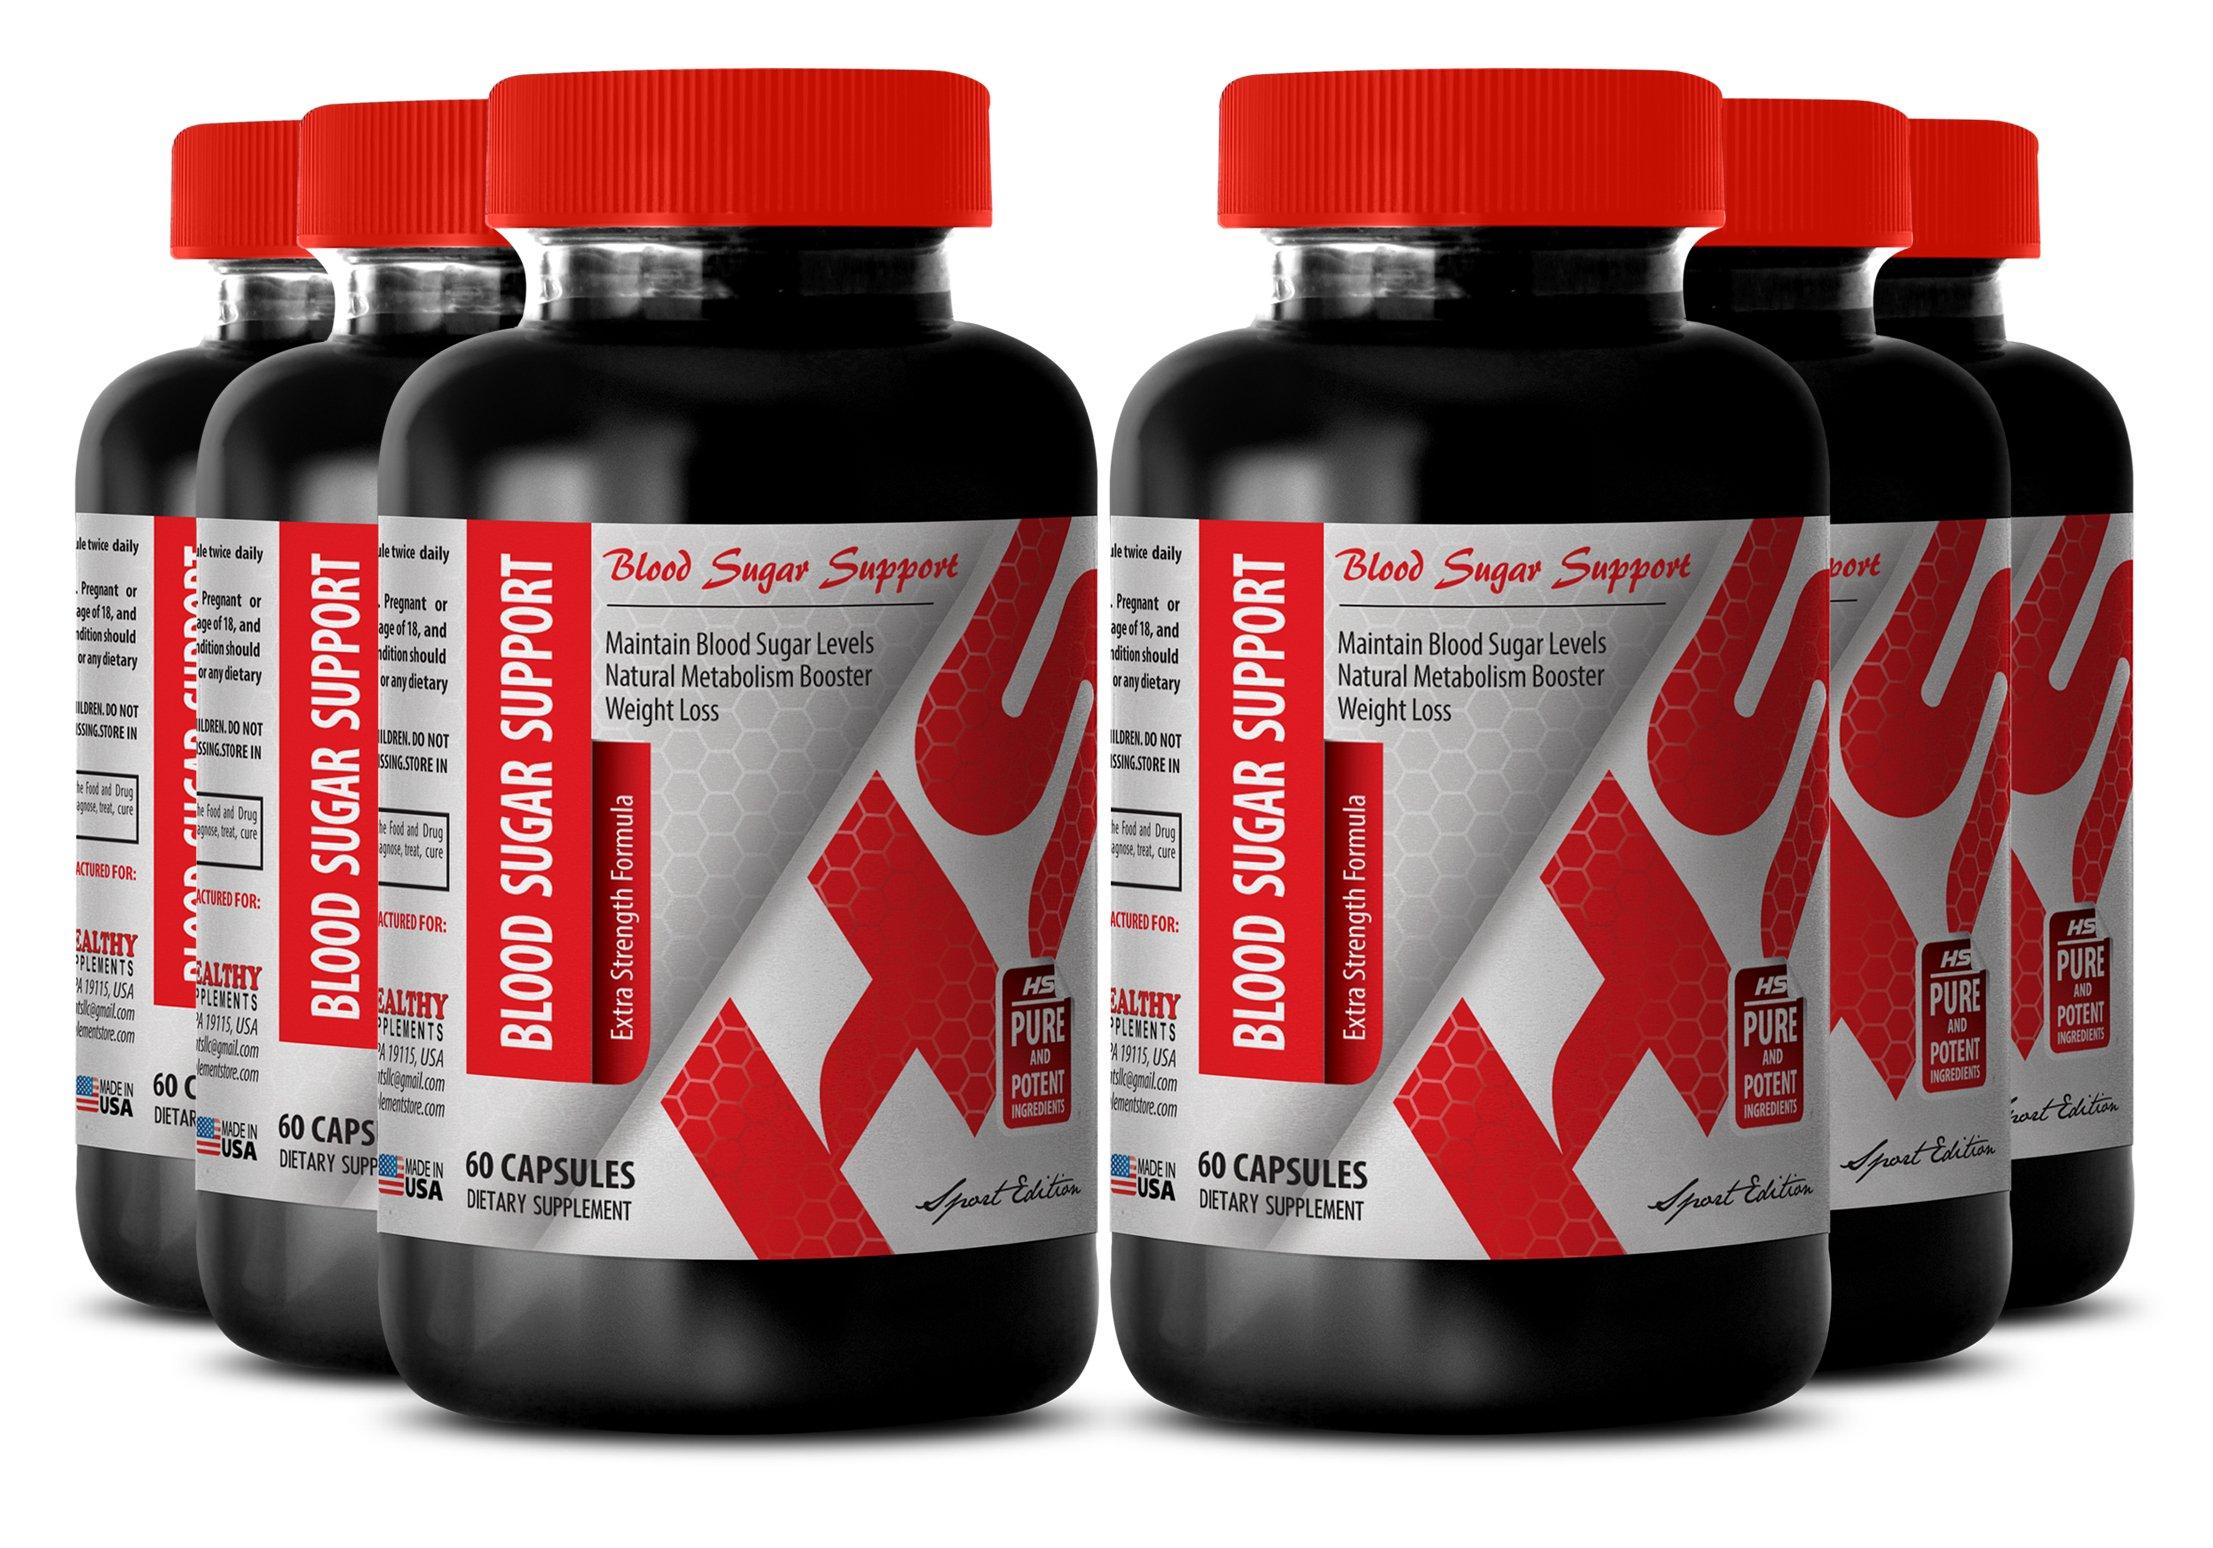 Yarrow supplement - BLOOD SUGAR SUPPORT - for weight maintenance (6 Bottles)